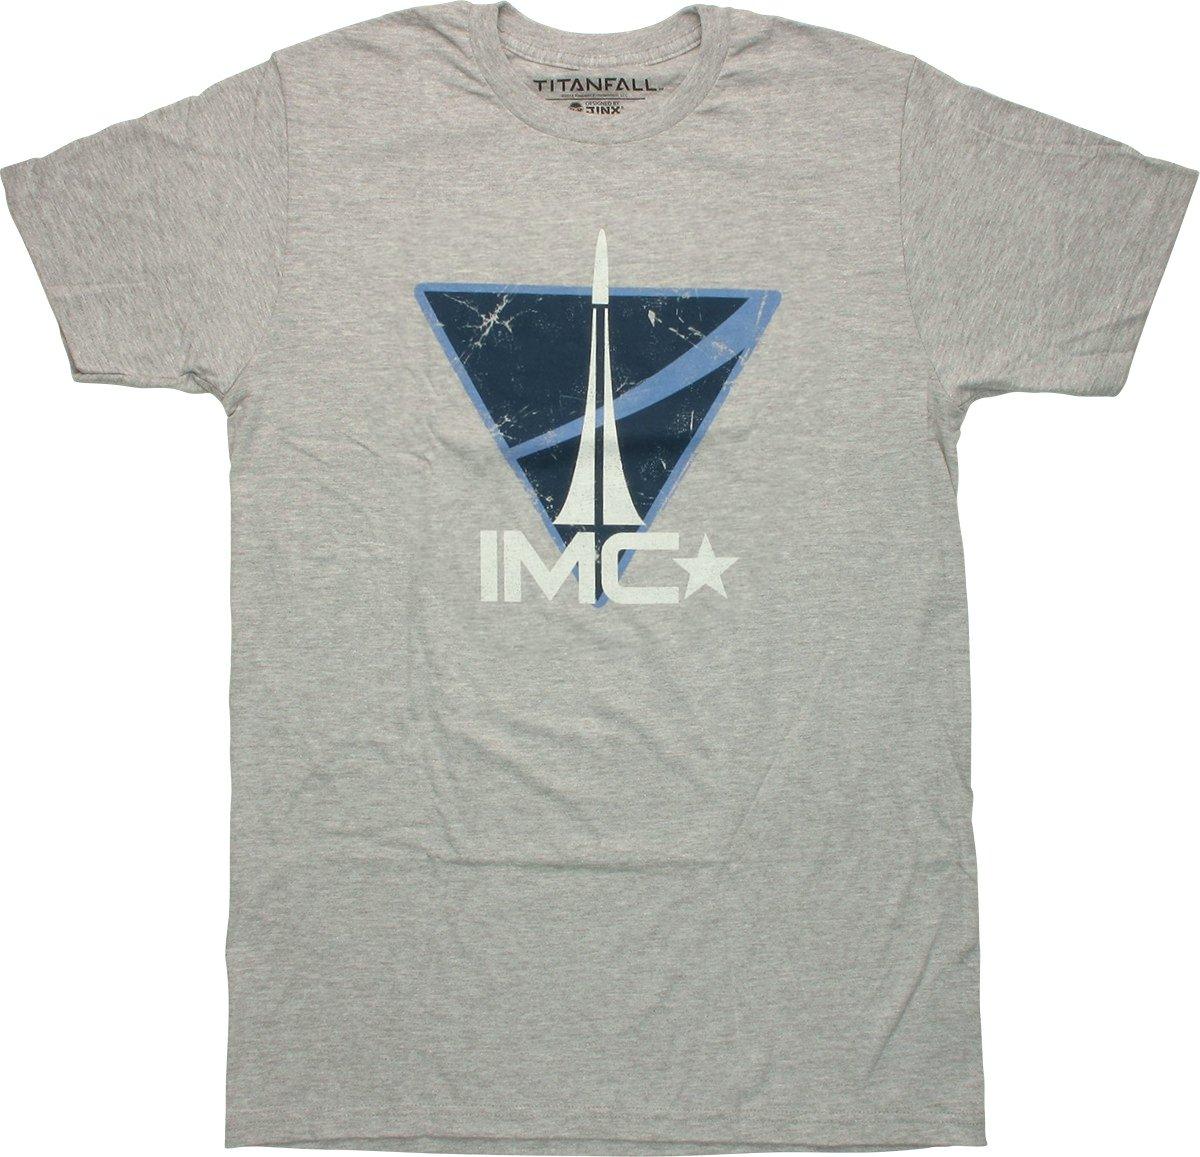 Titanfall IMC Logo T-Shirt